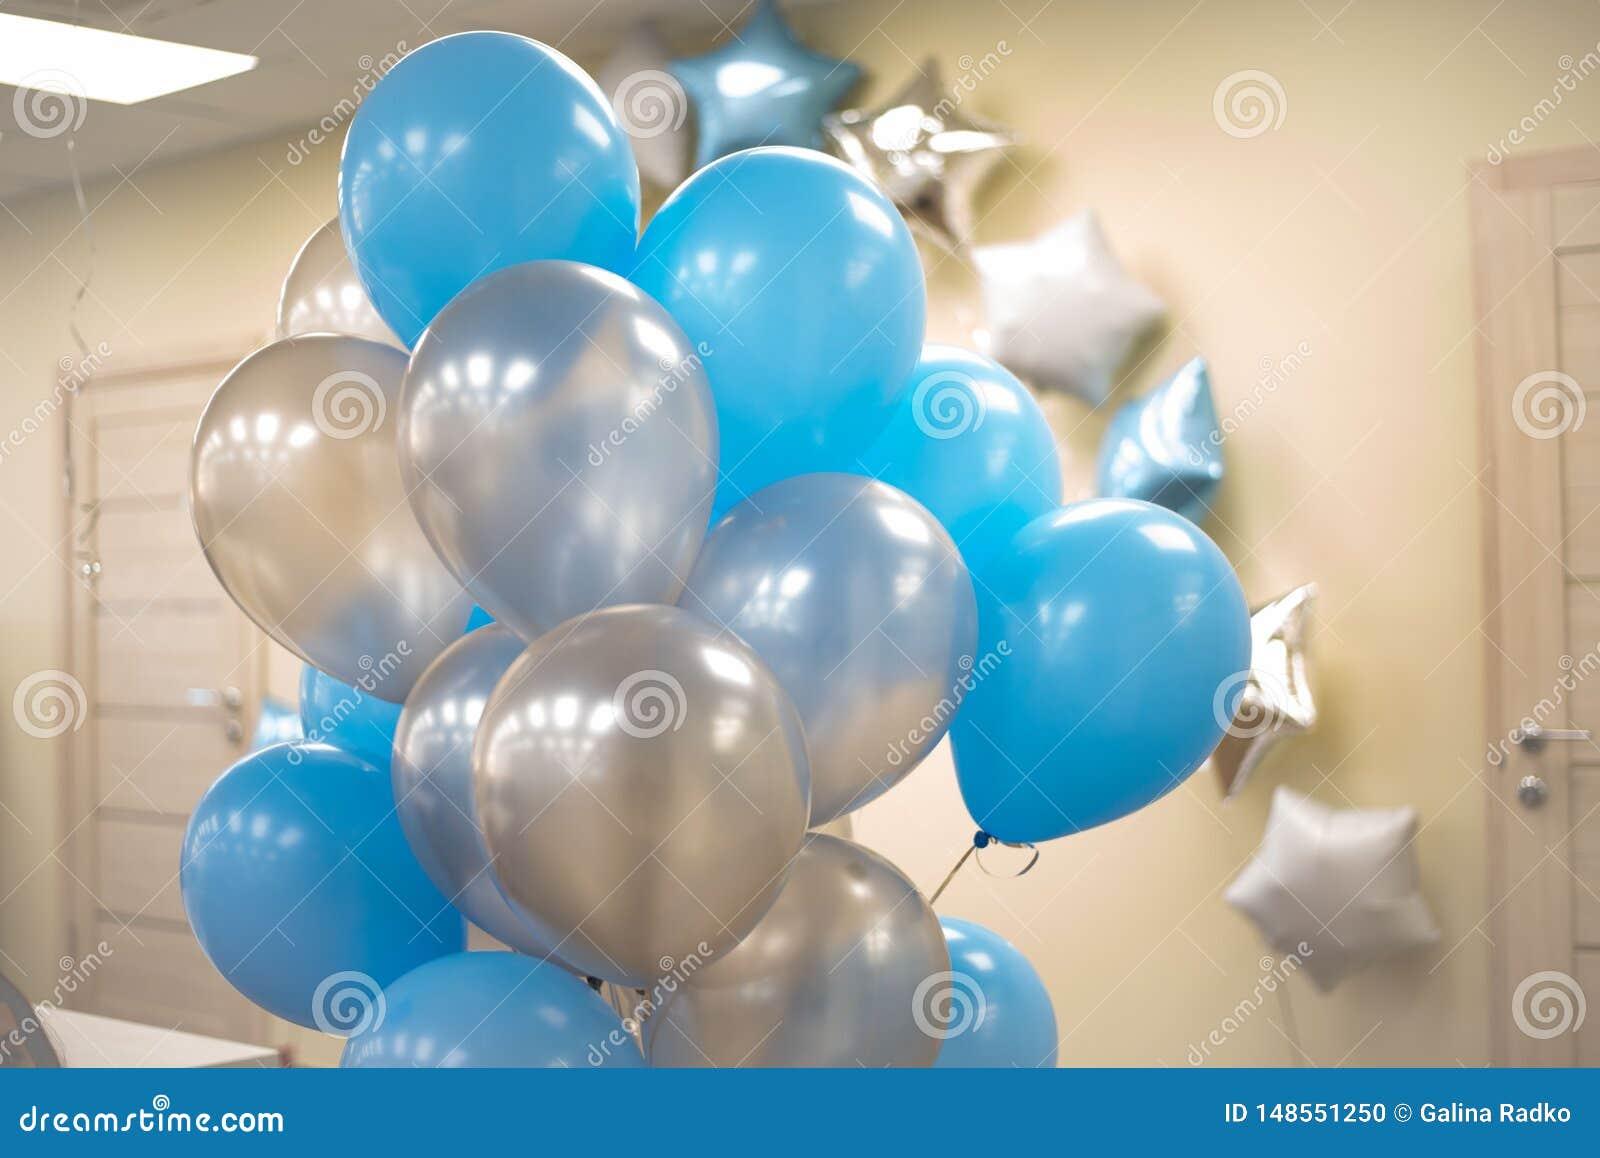 Bal?es azuis e brancos no escrit?rio Conceito de Celebraty Backgound